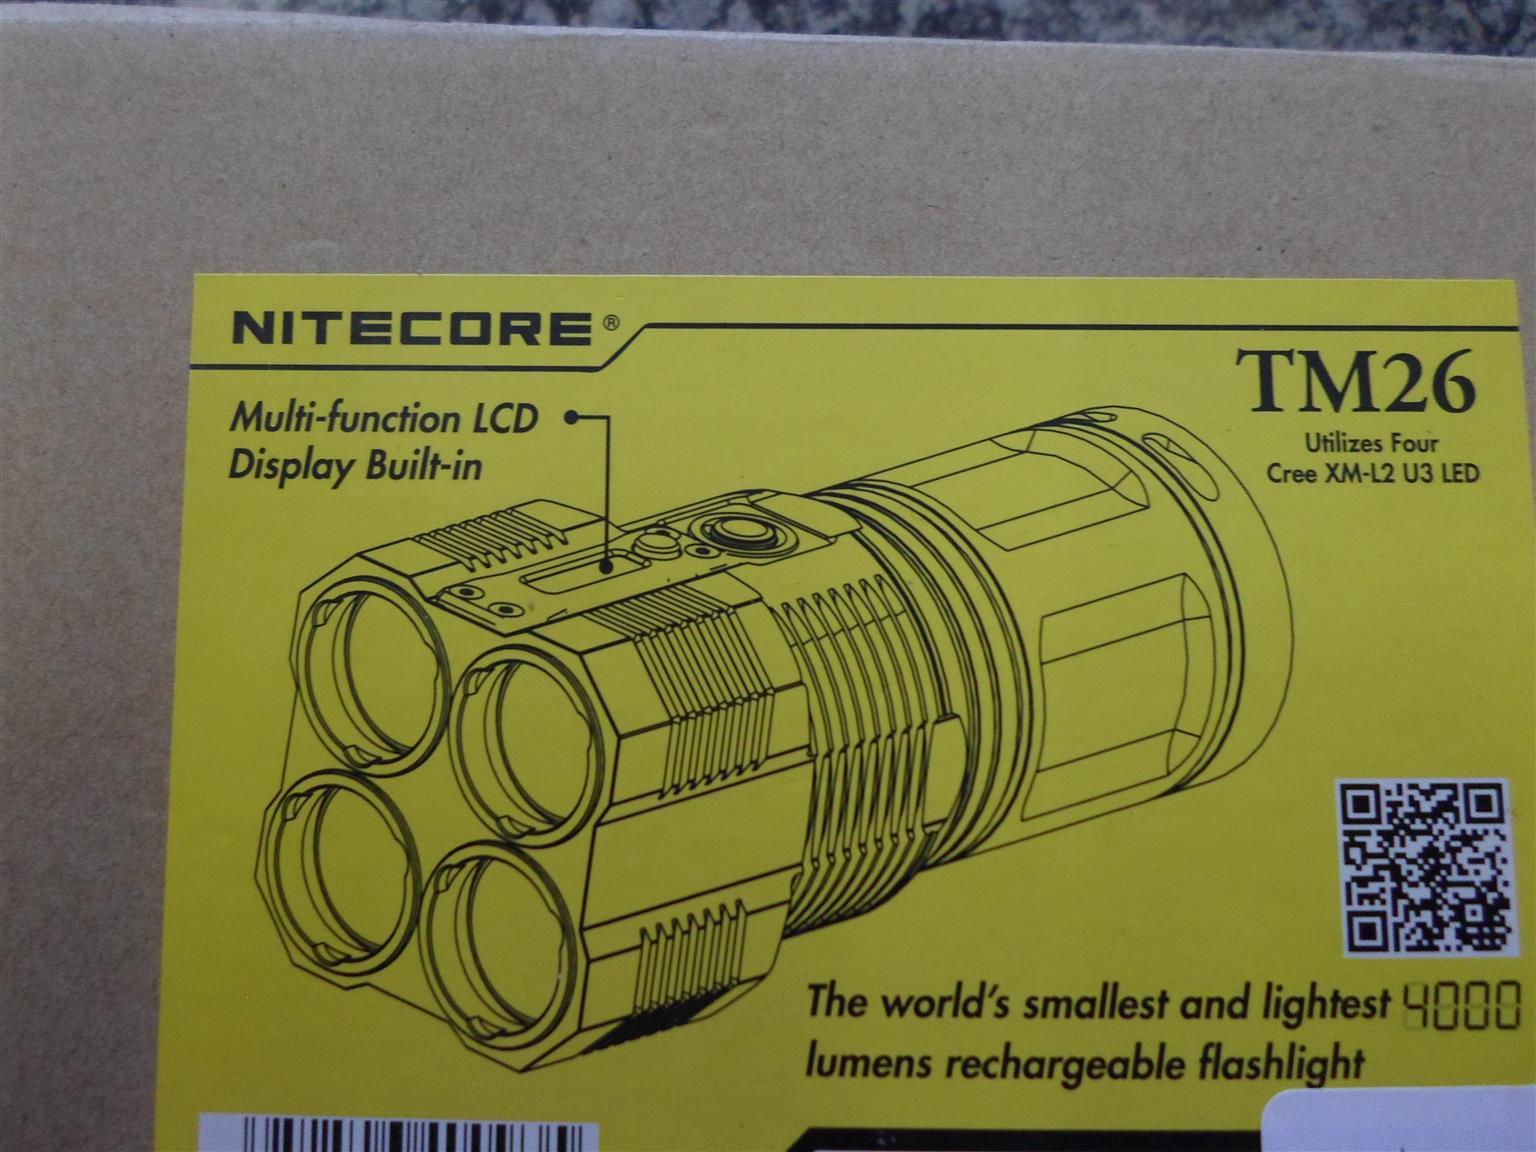 Nitecore 4000 Lumens Flashlight